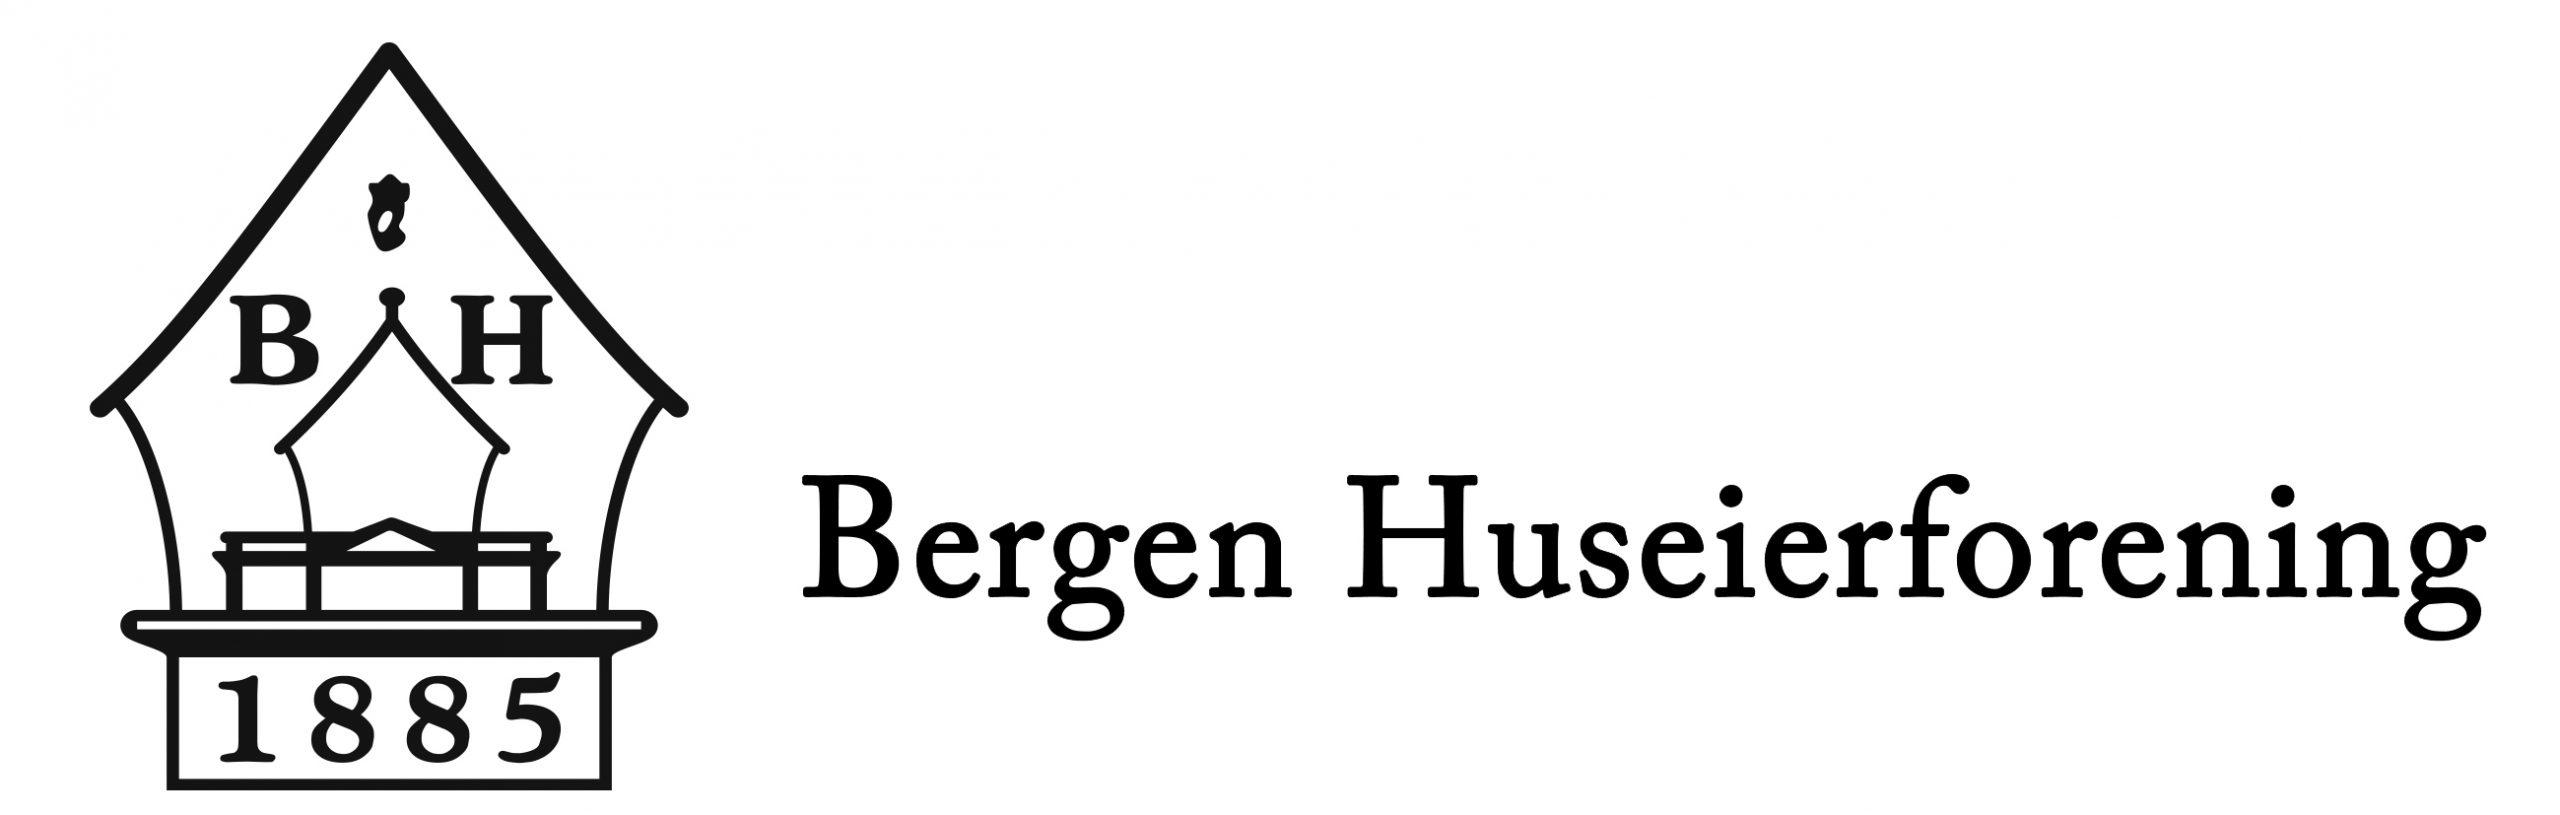 Bergen Huseierforening